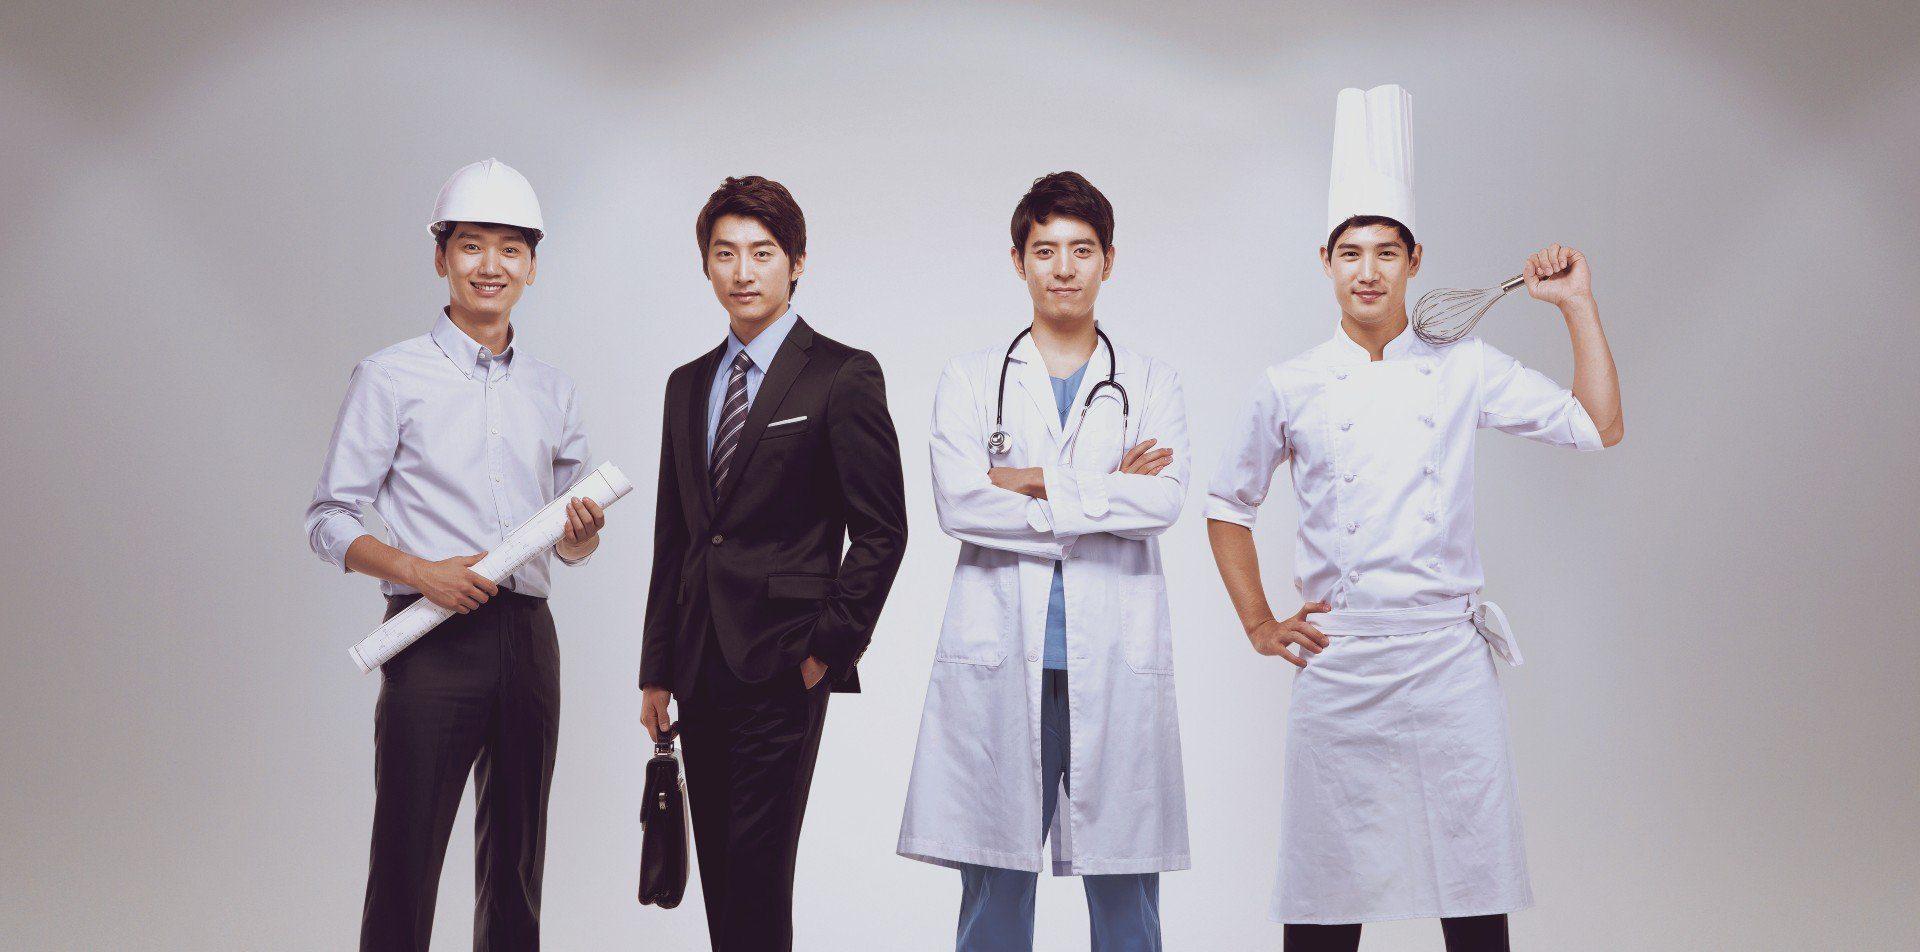 Top 10 Highest Paid Jobs In Korea